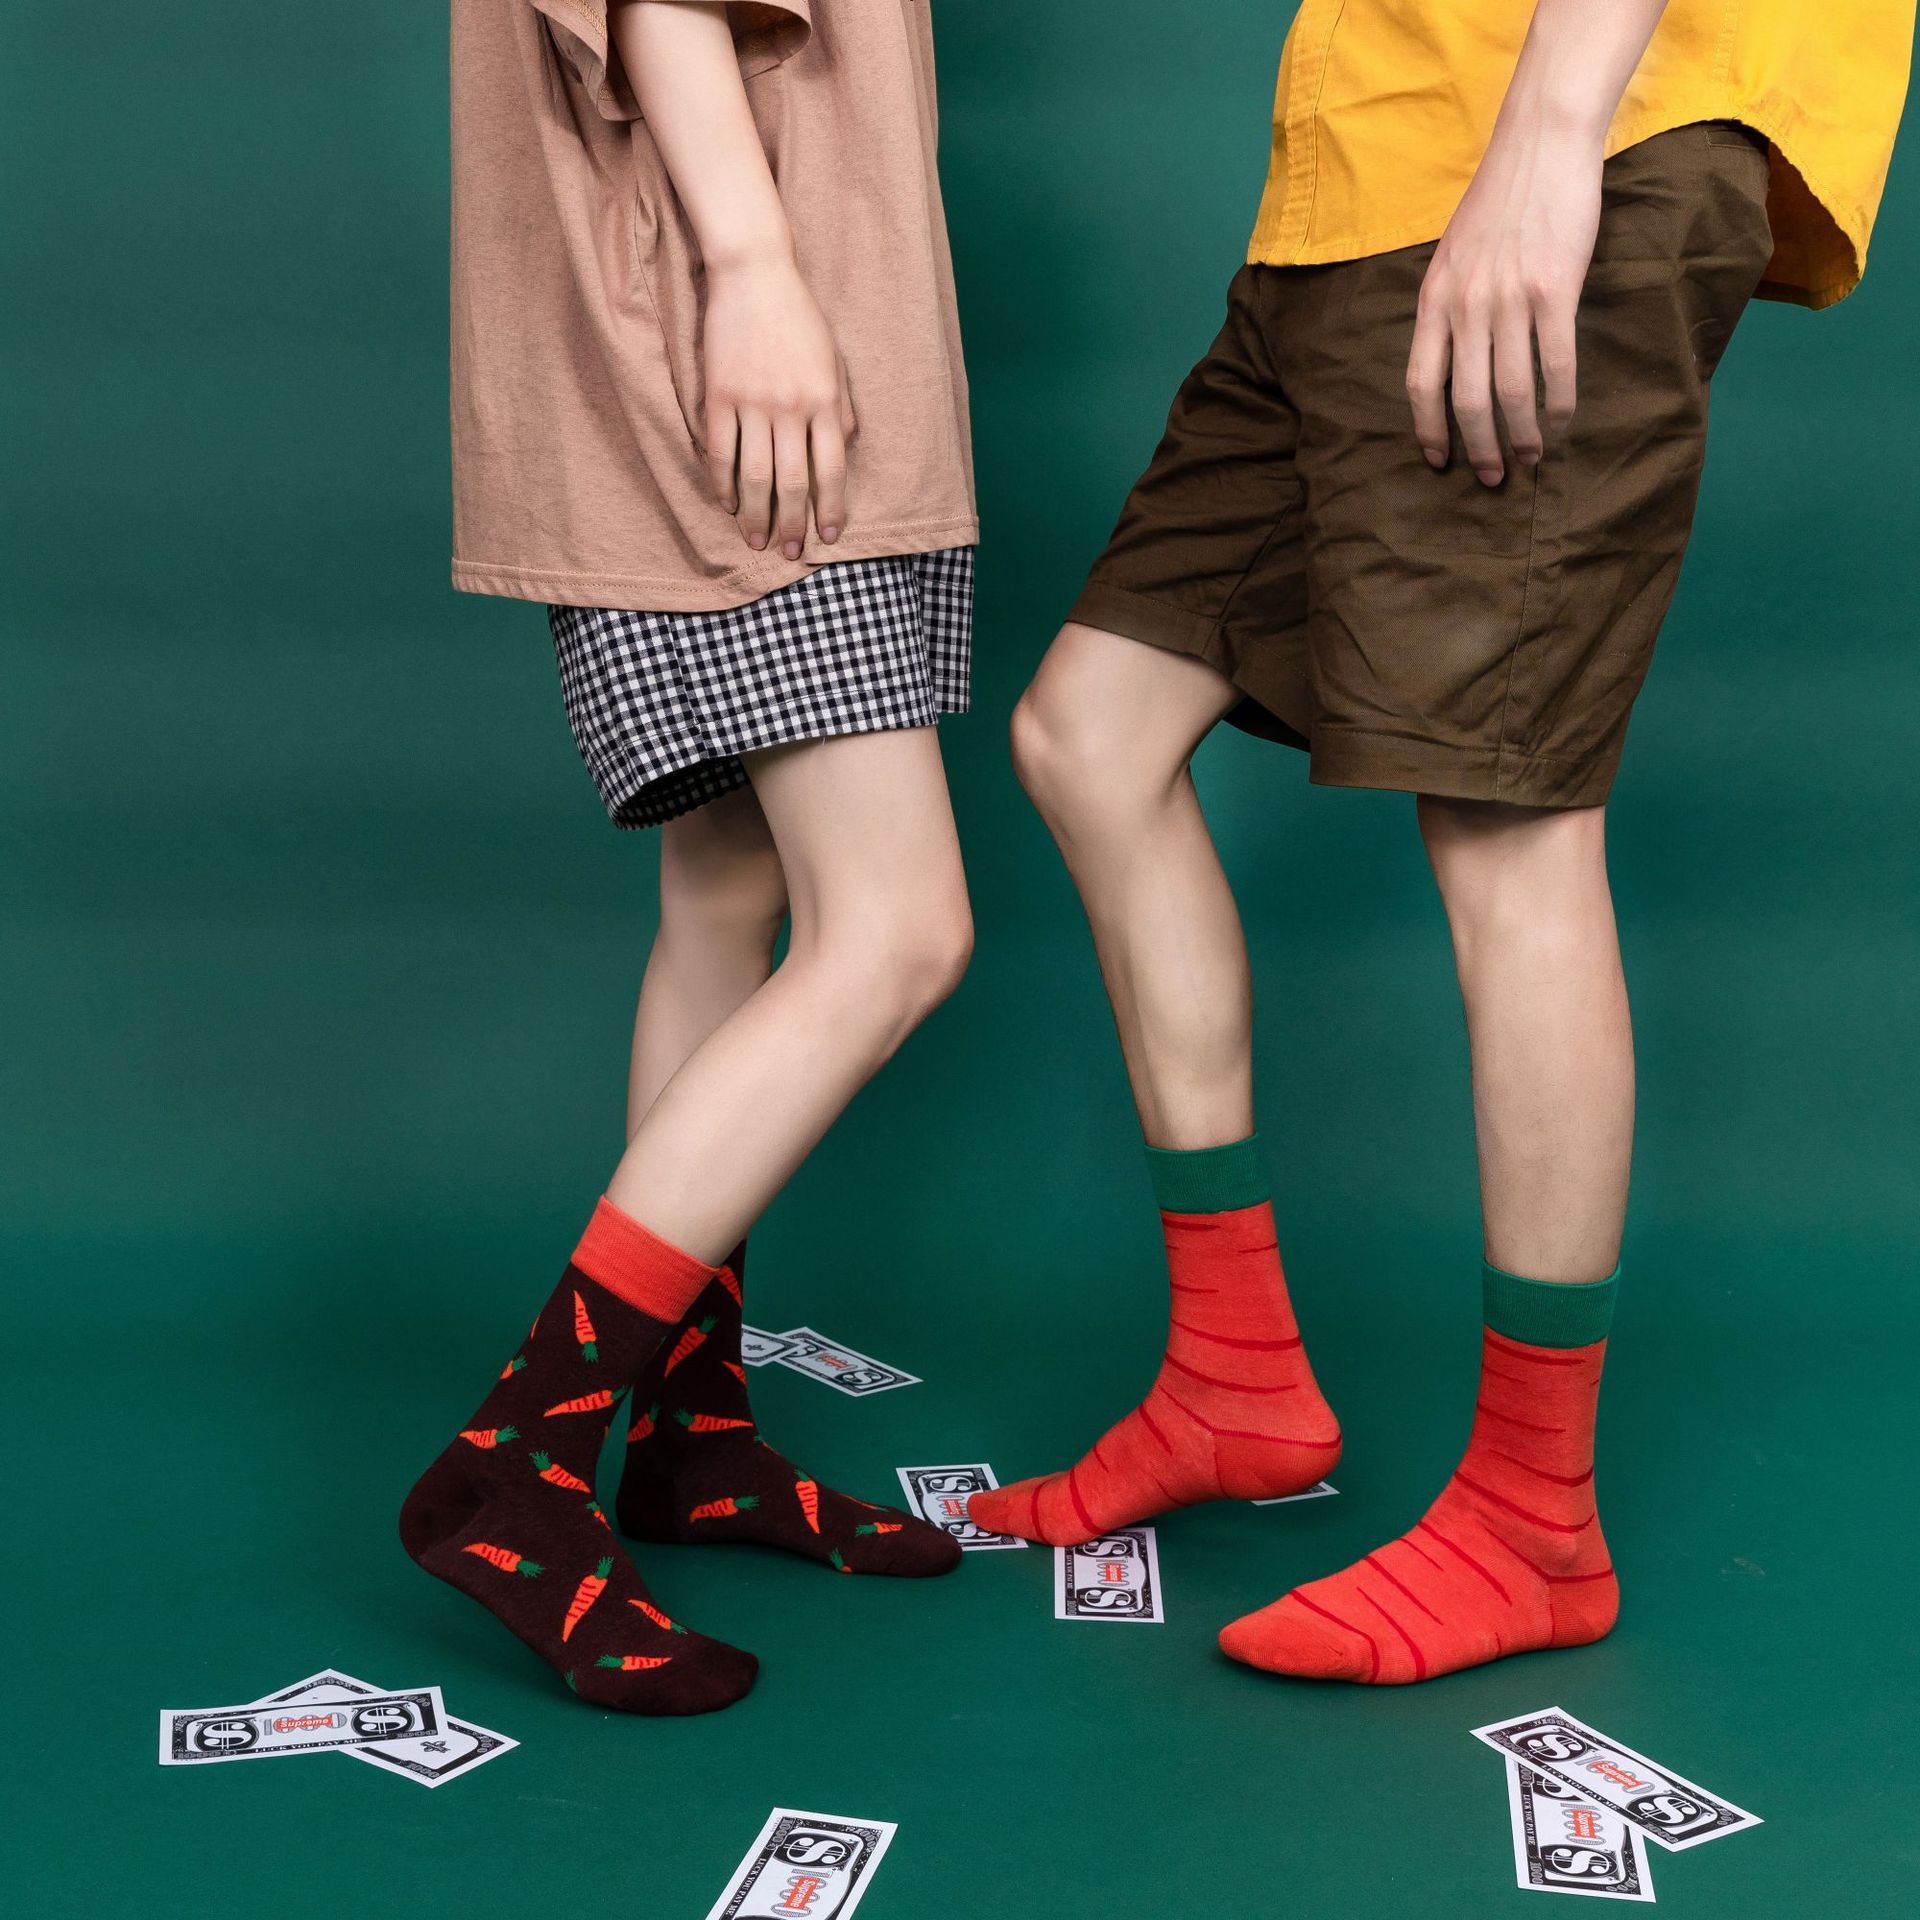 New European American Colorful Watermelon Fruit Socks Couple Casual Street Wear Pure Cotton Stockings Men Socks Women  Harajuku